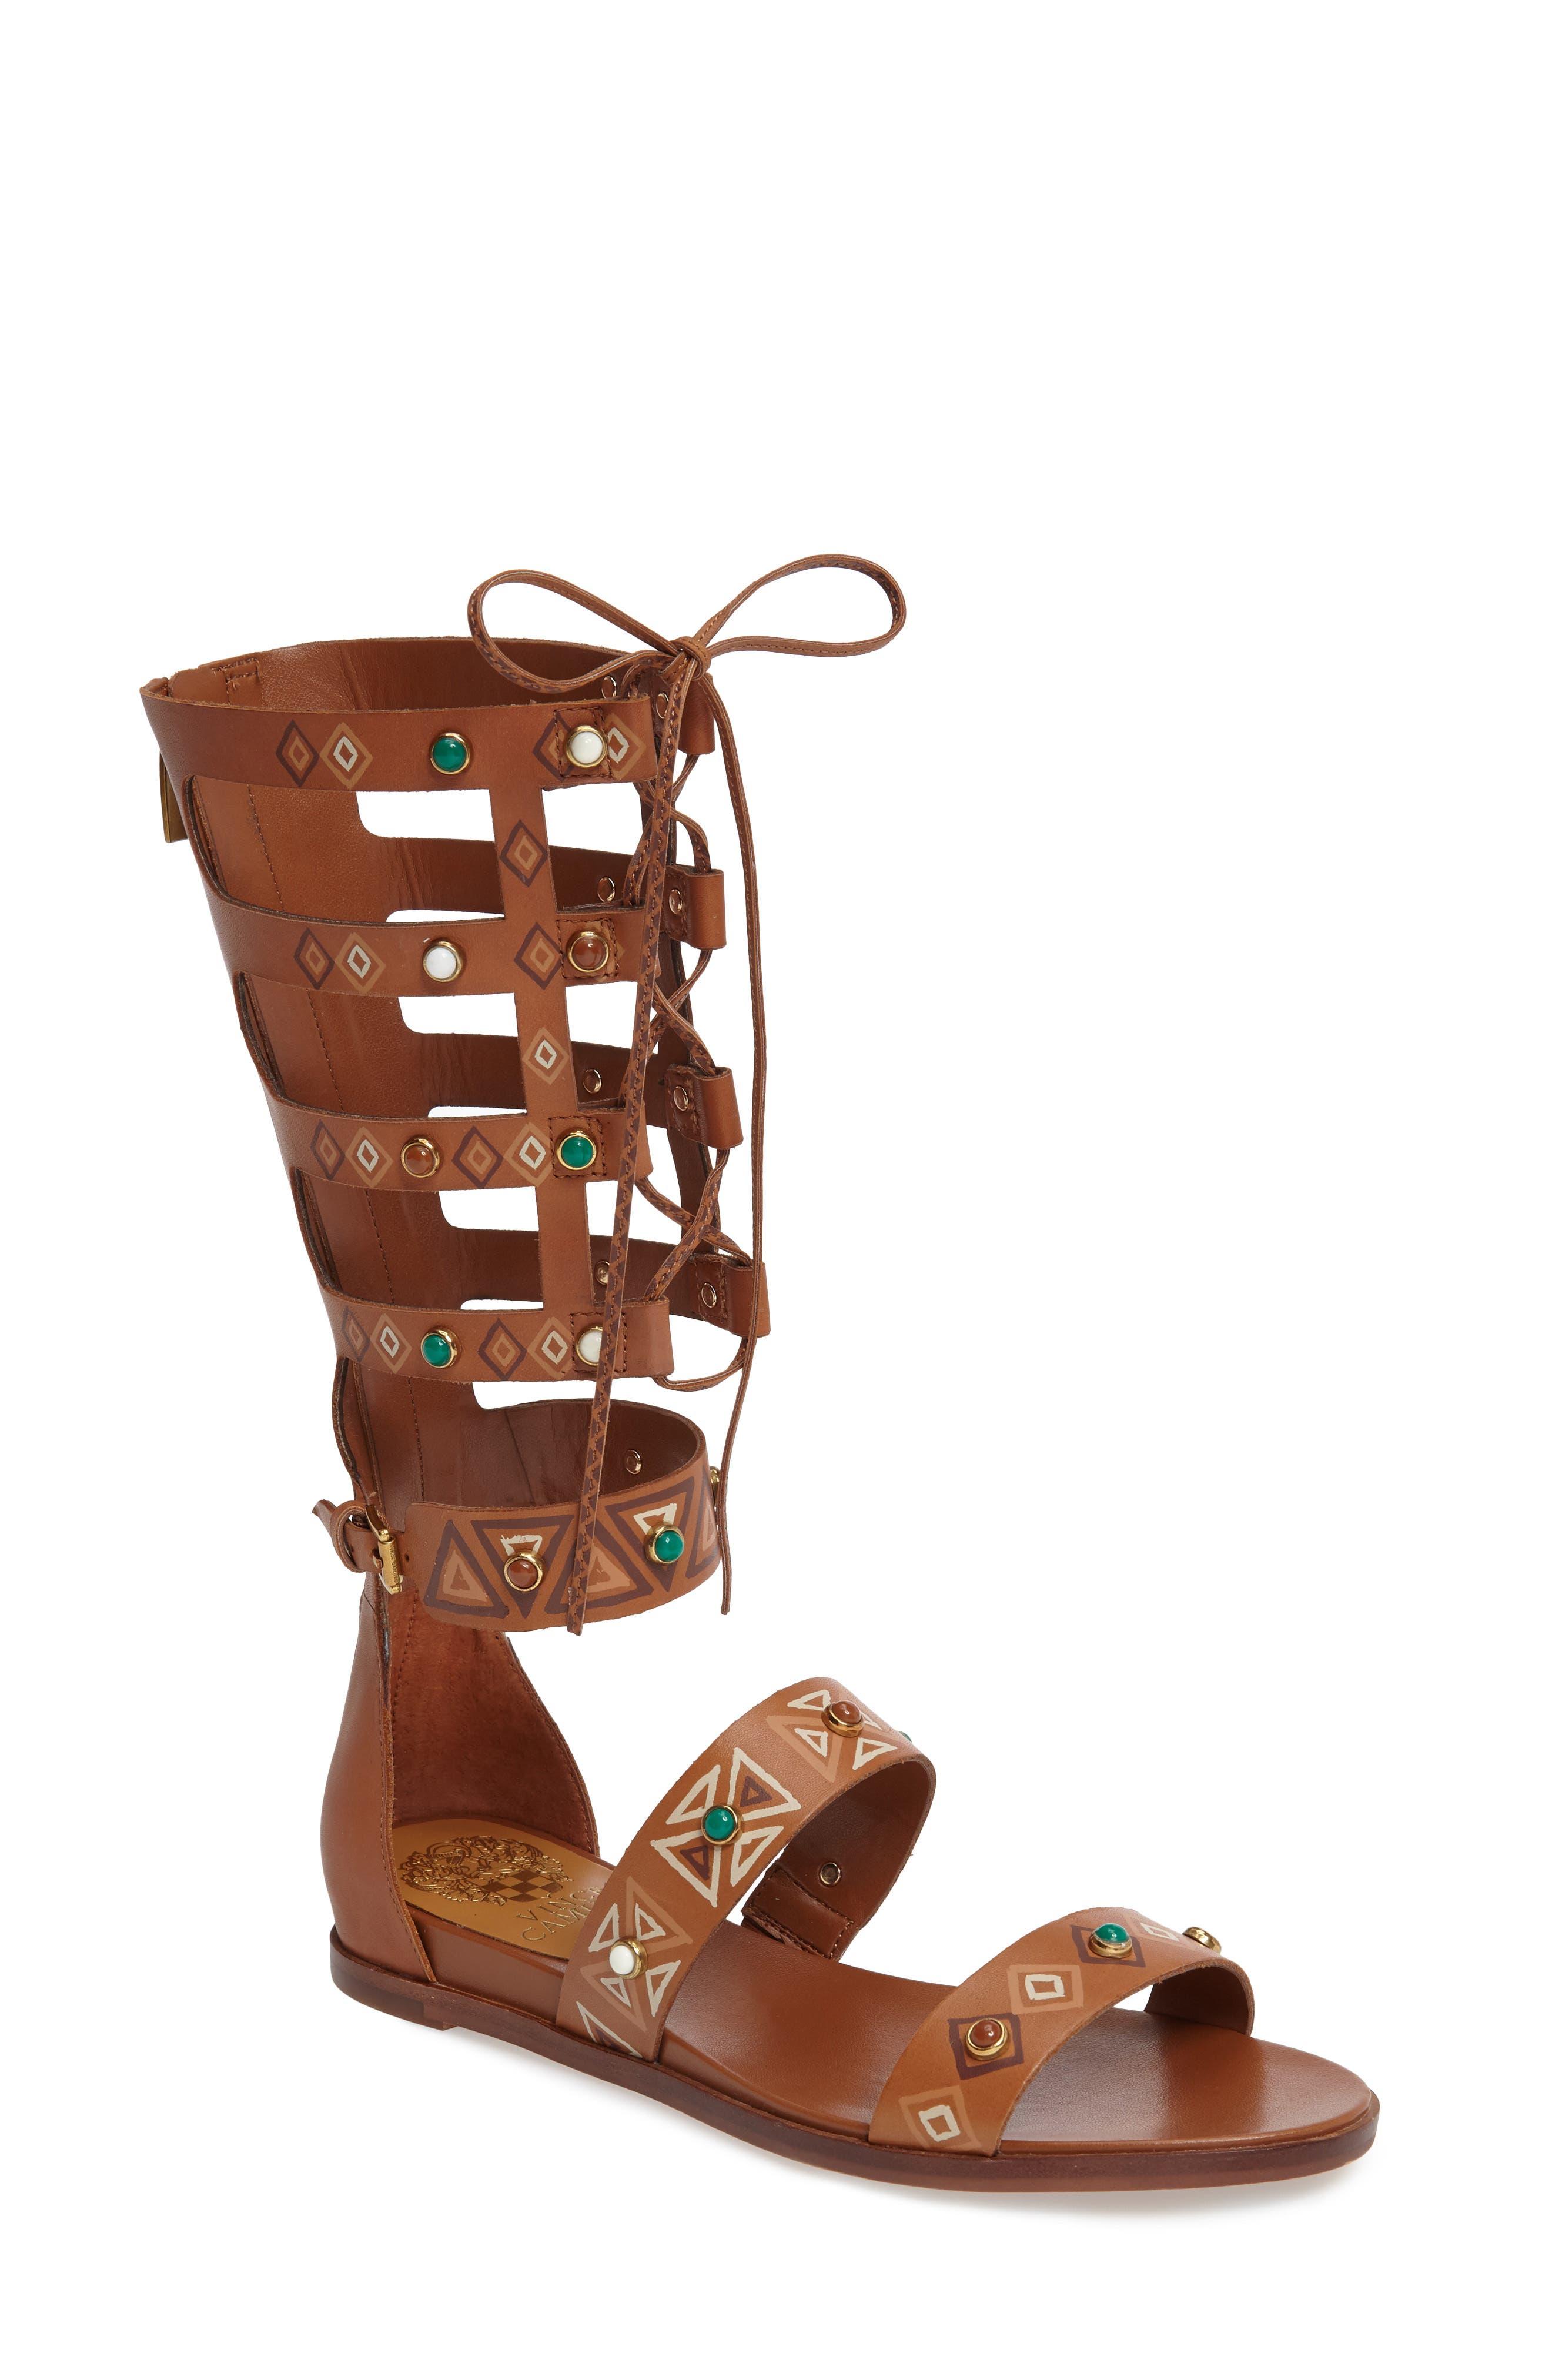 Alternate Image 1 Selected - Vince Camuto Shandon Gladiator Sandal (Women)